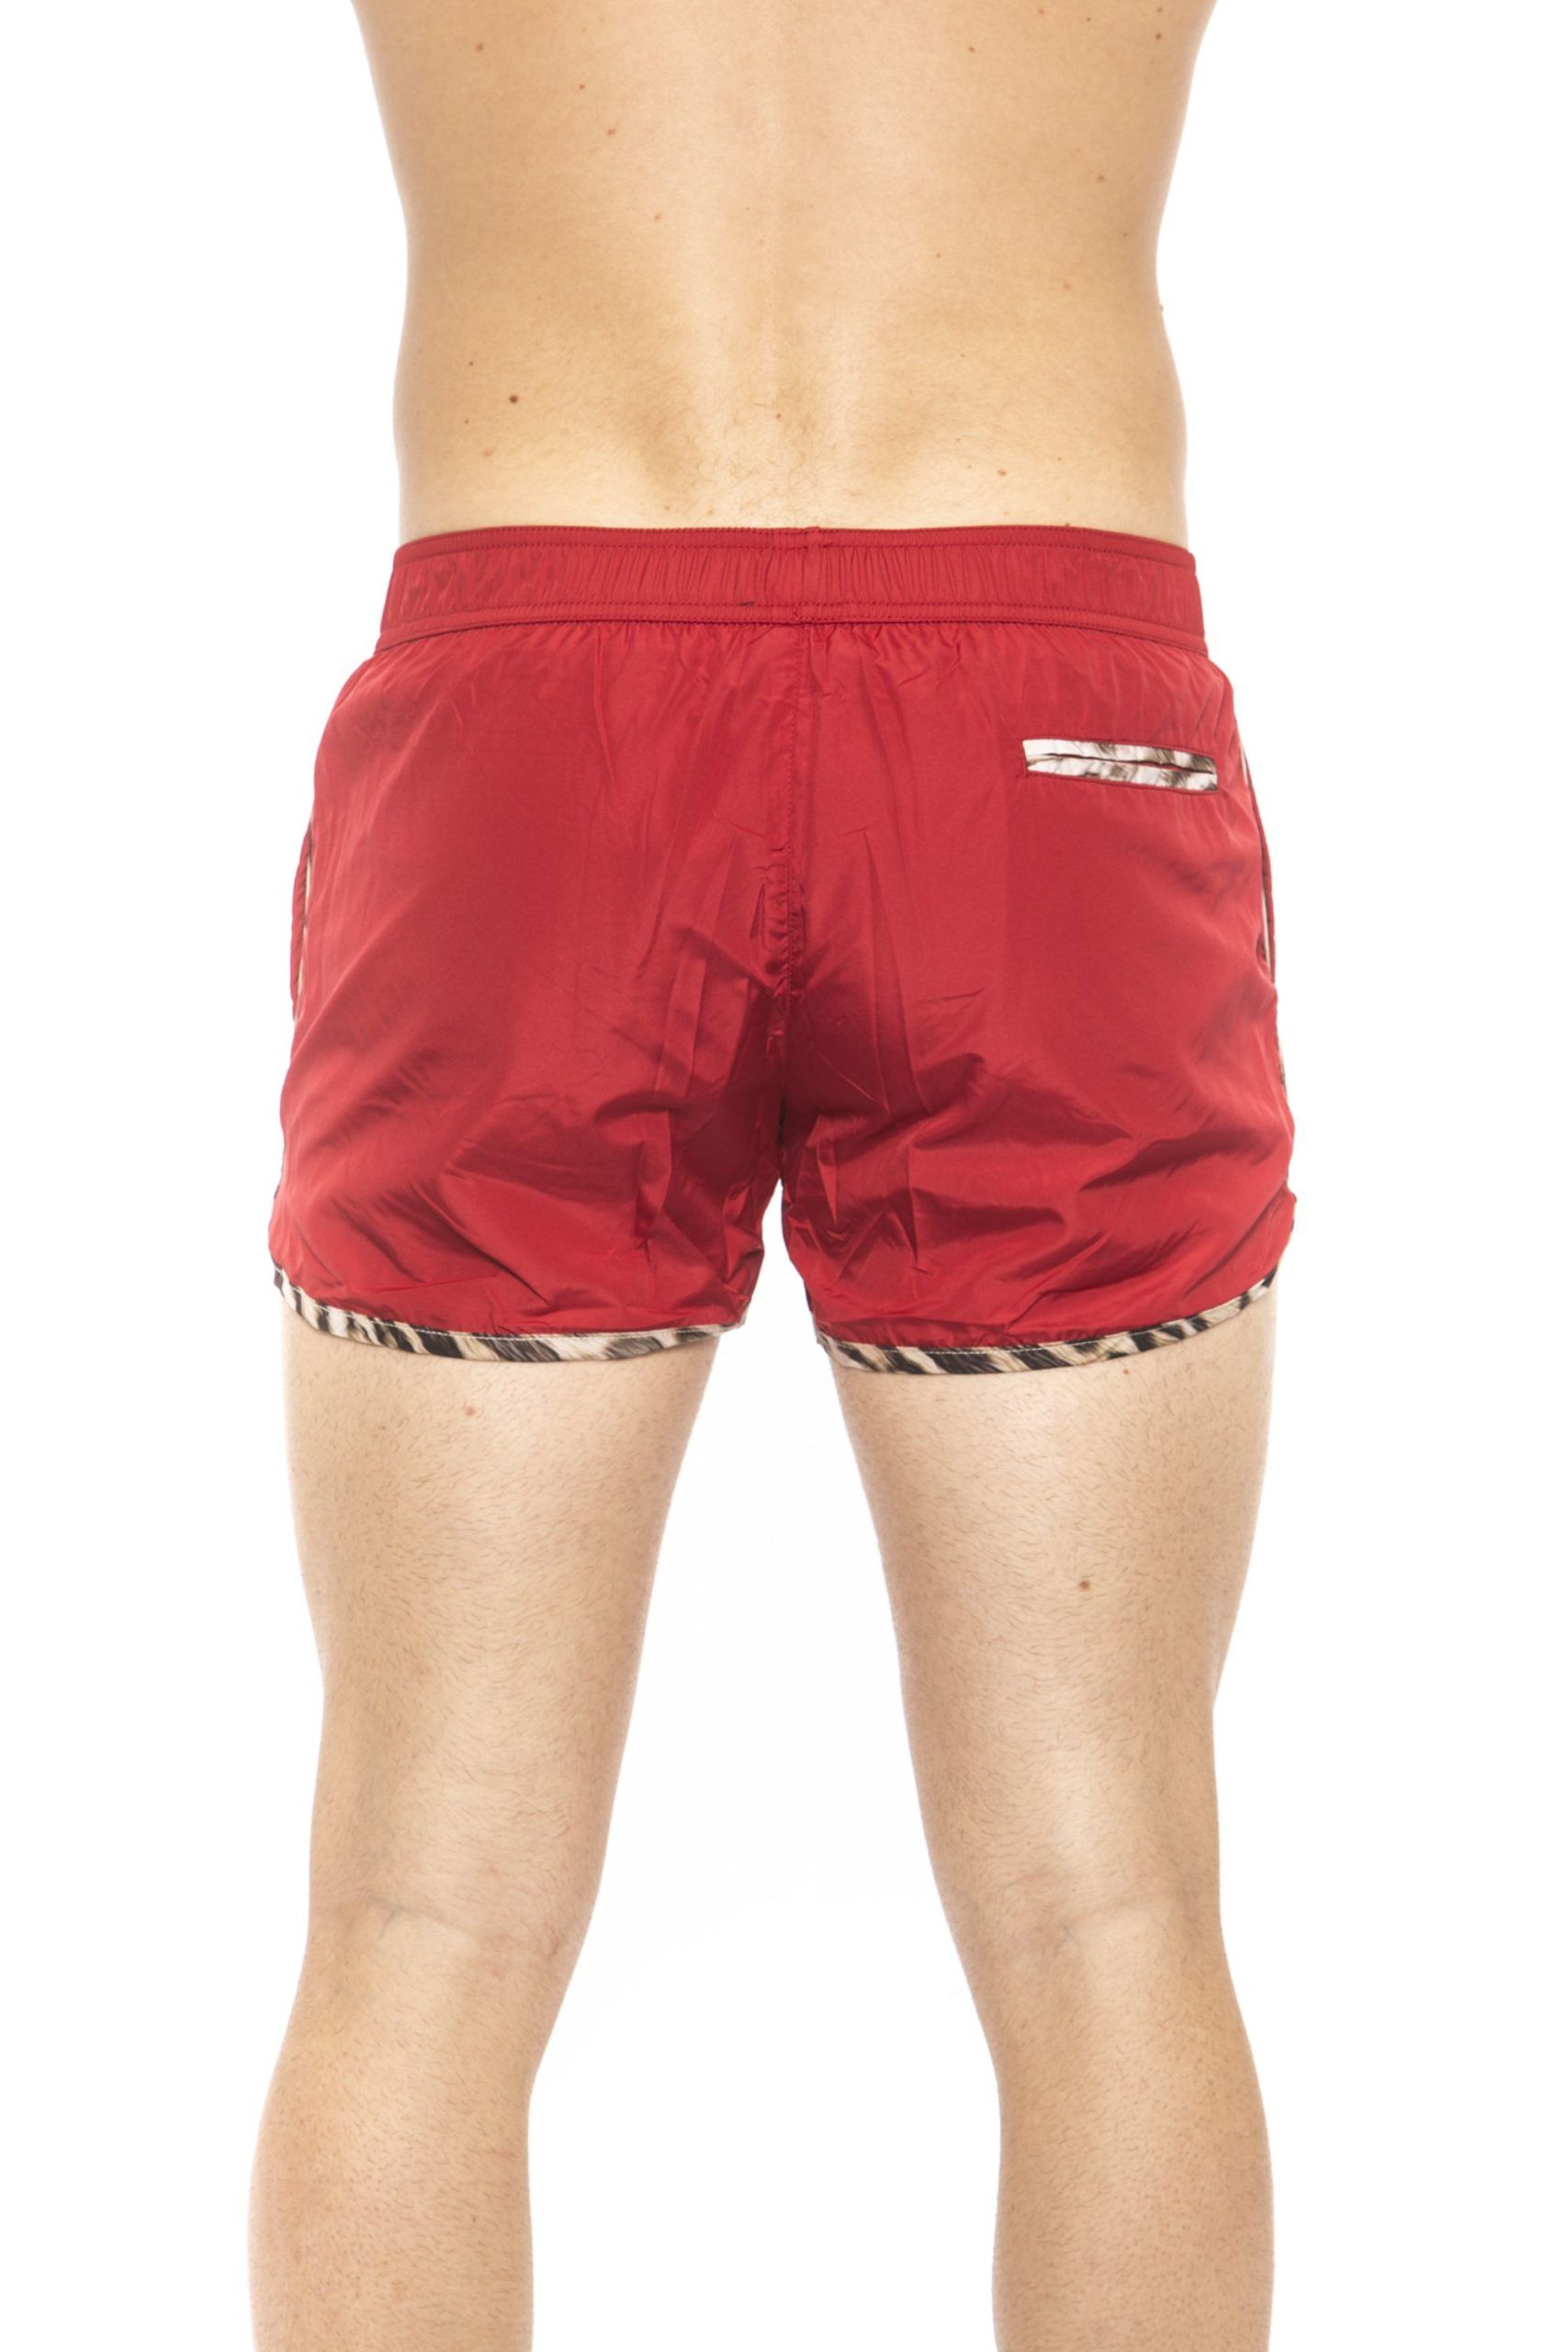 Roberto Cavalli Beachwear Red Beachwear Boxer With Pockets. Front Logo Print. Internal Net. Back Pocket. Spotted Edges.